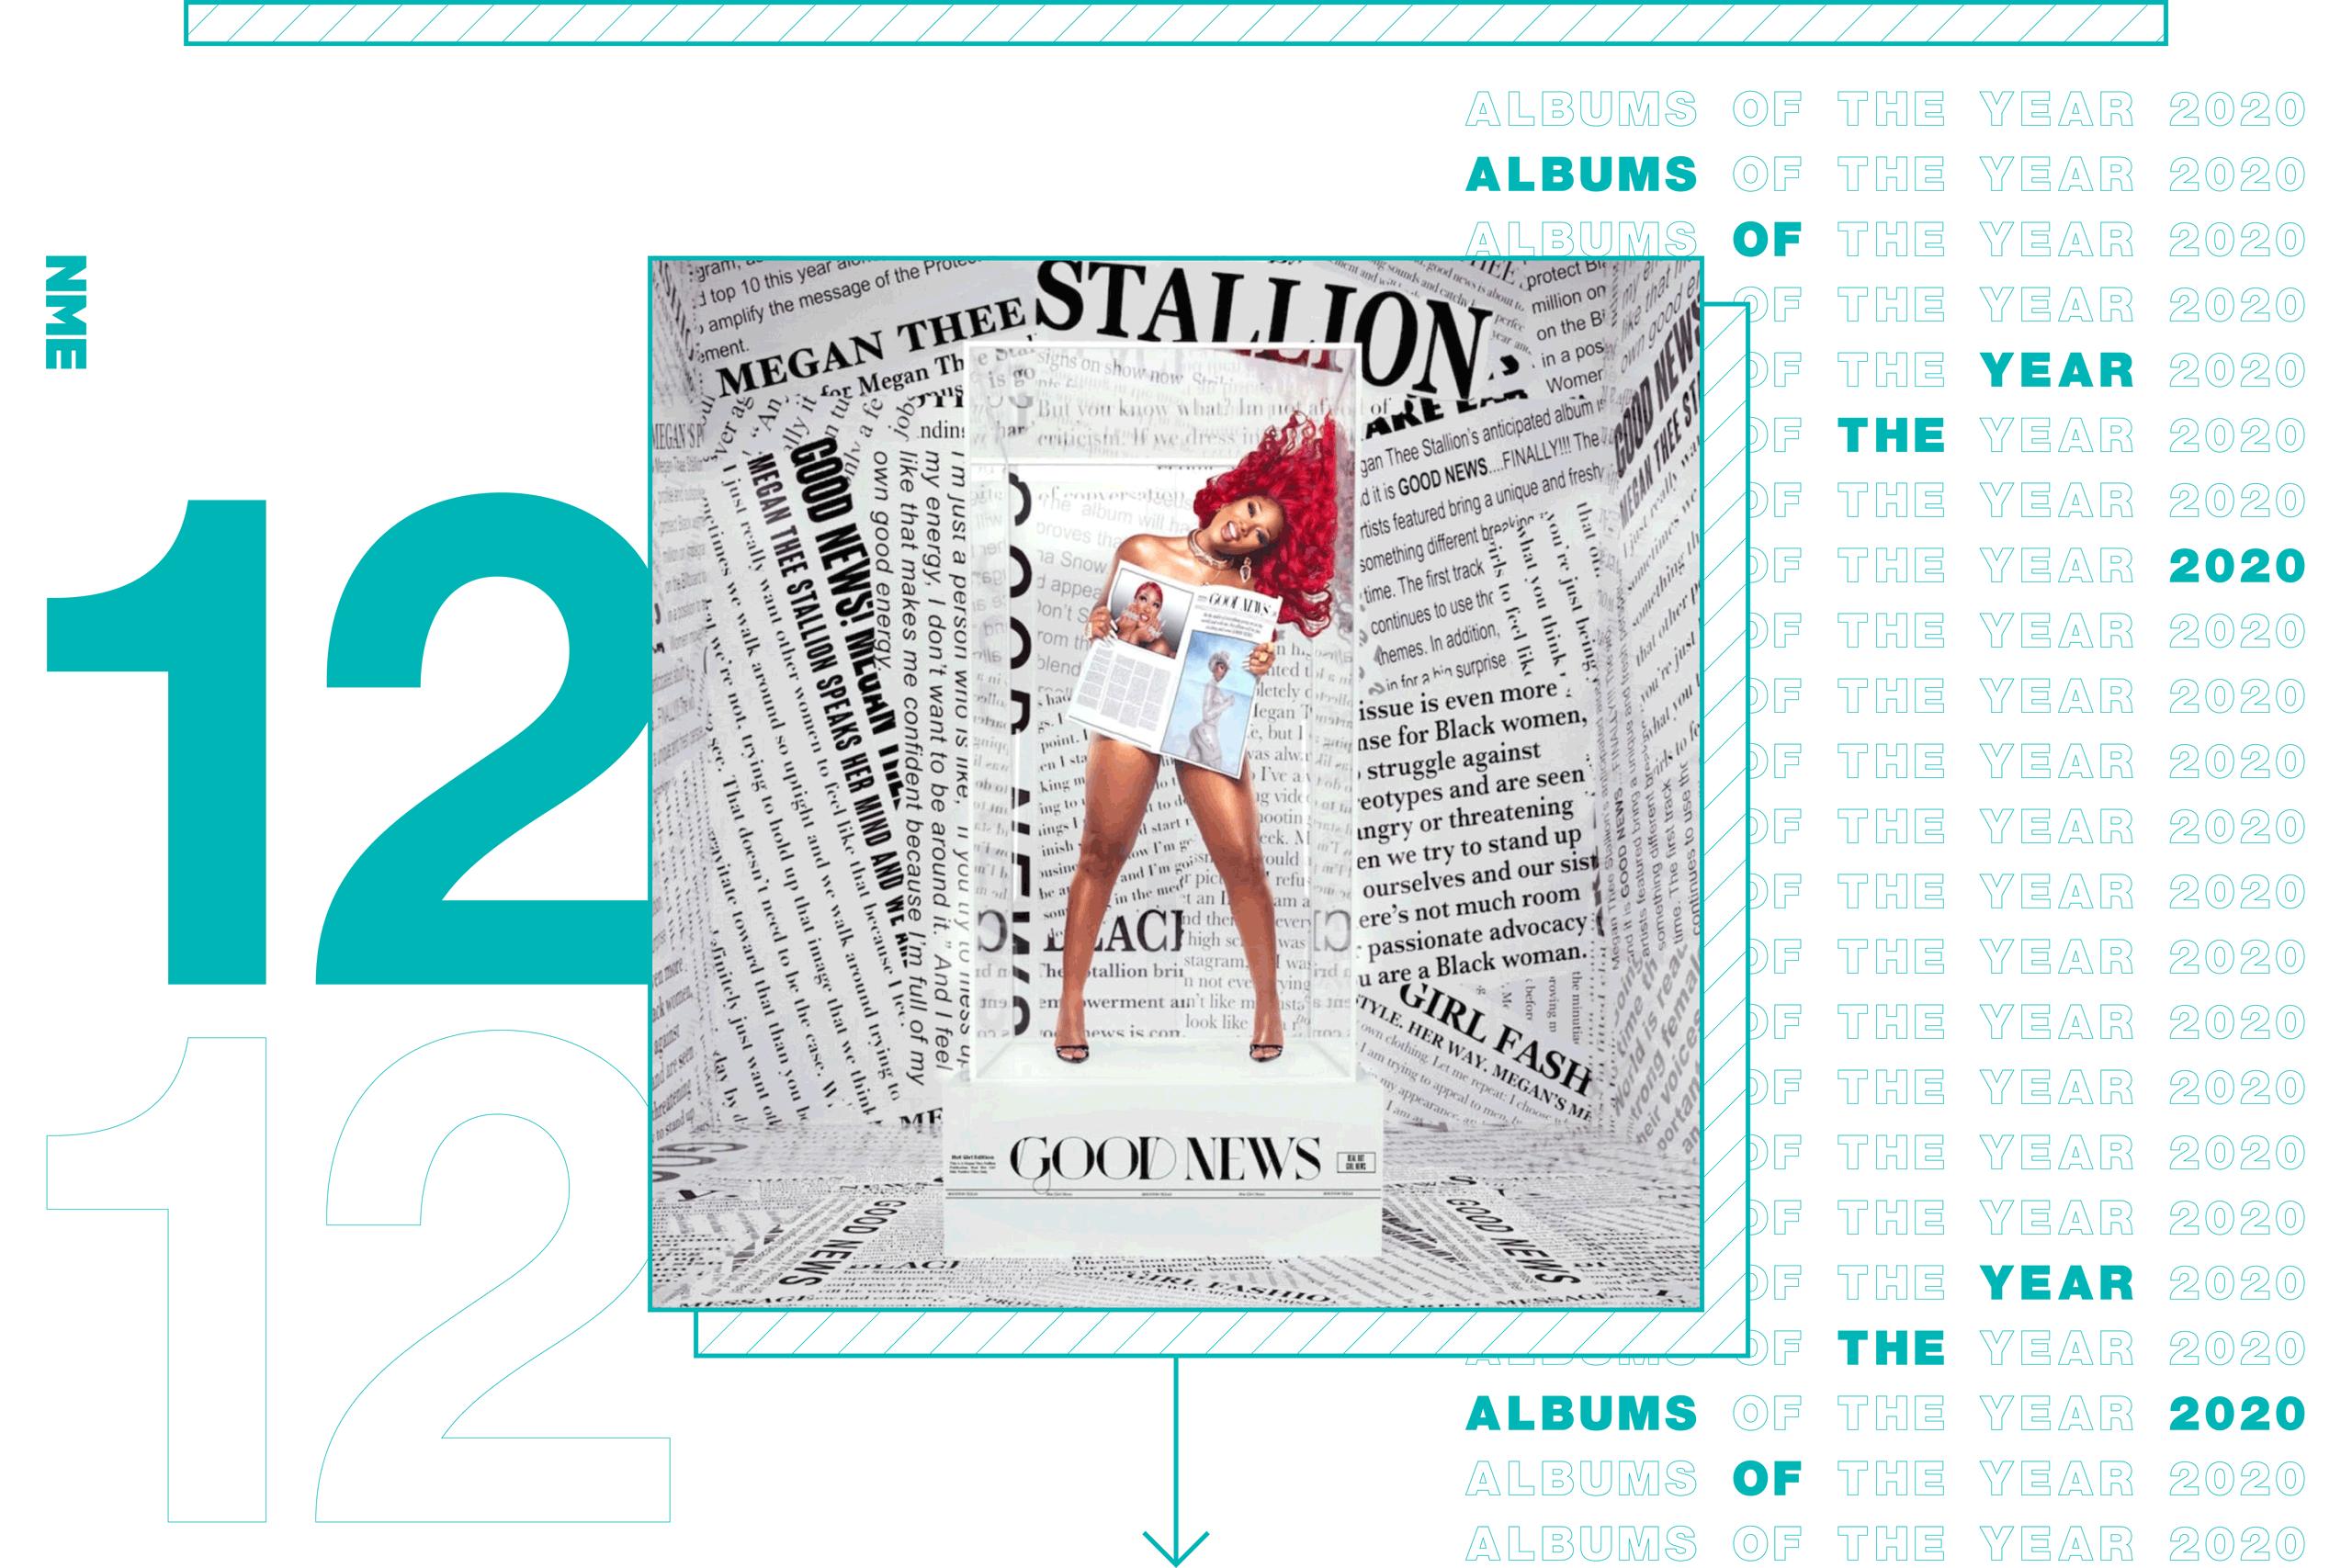 NME Album Of The Year 2020 Megan Thee Stallion, 'Good News'